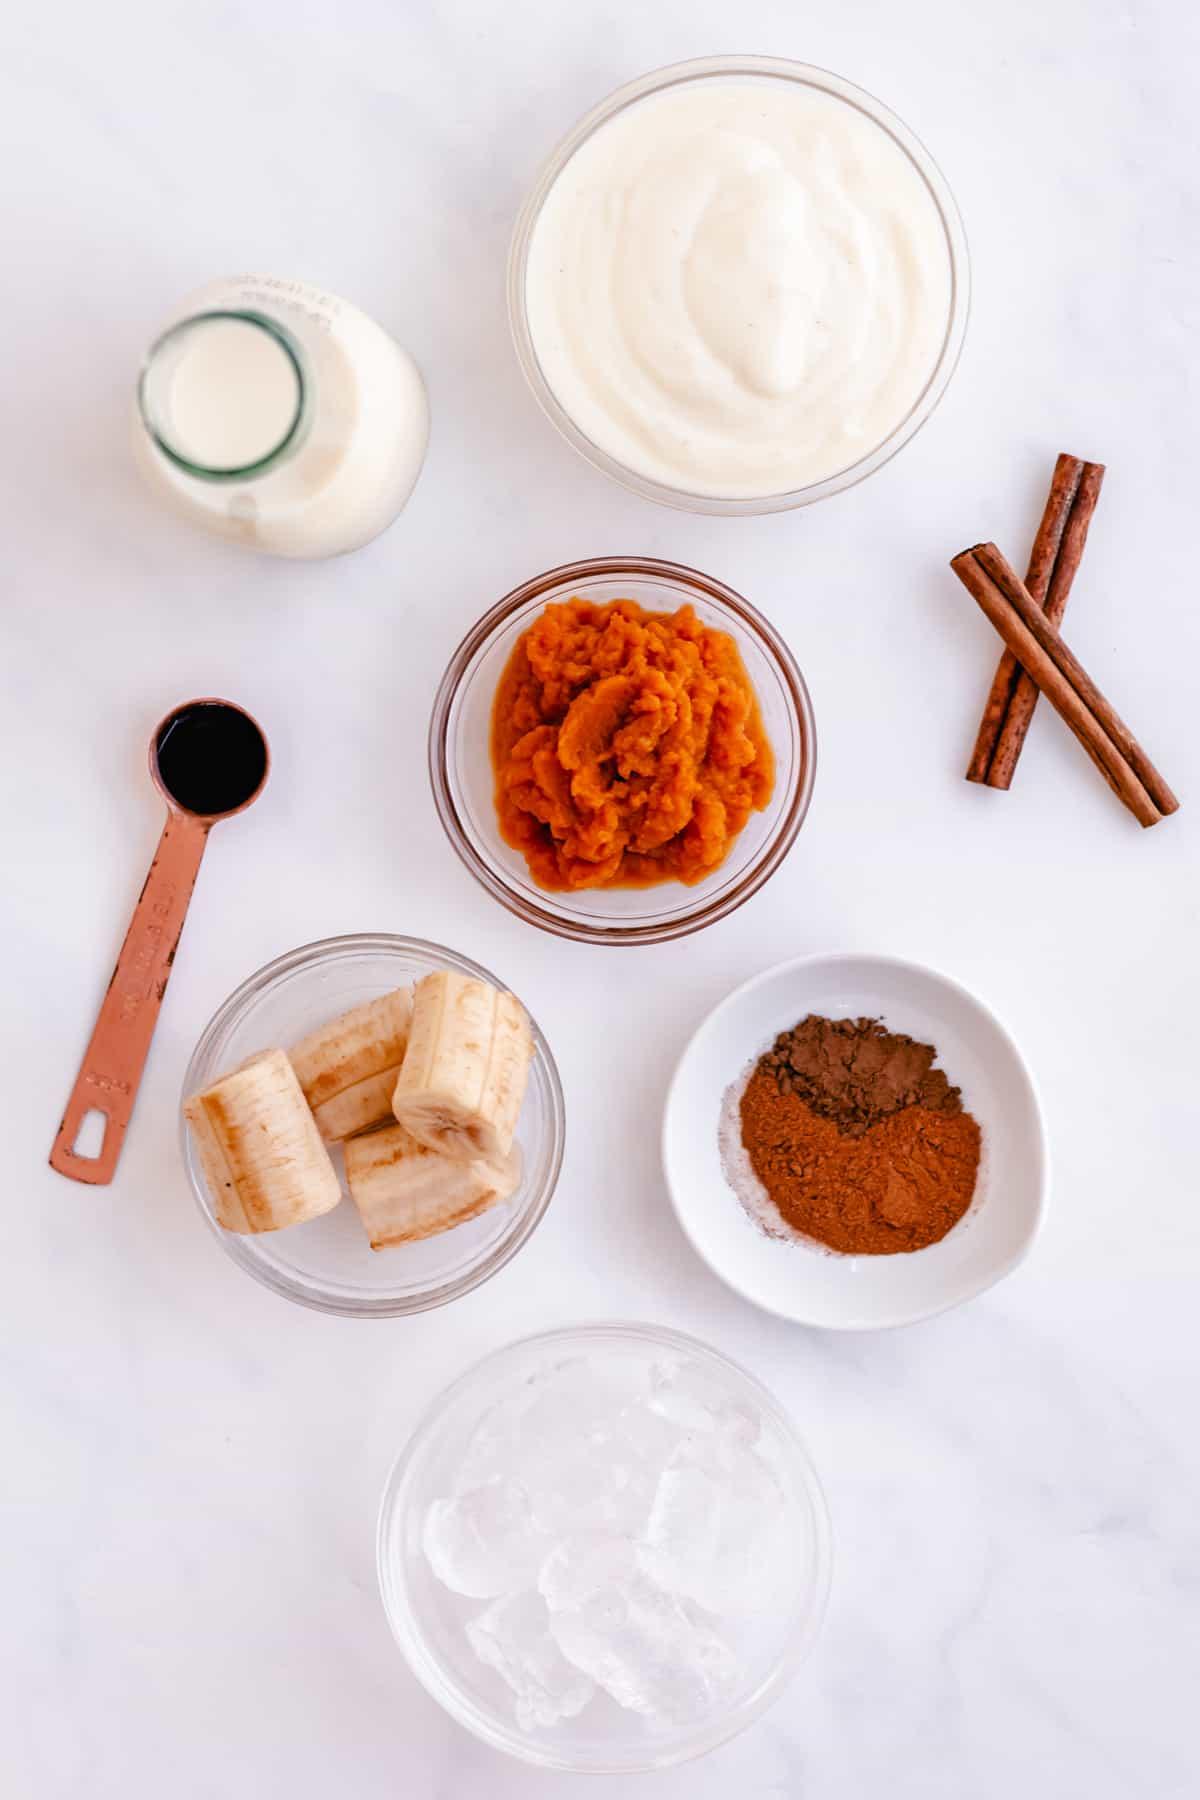 yogurt, milk, pumpkin puree, cinnamon sticks, banana, pumpkin pie spices on a counter